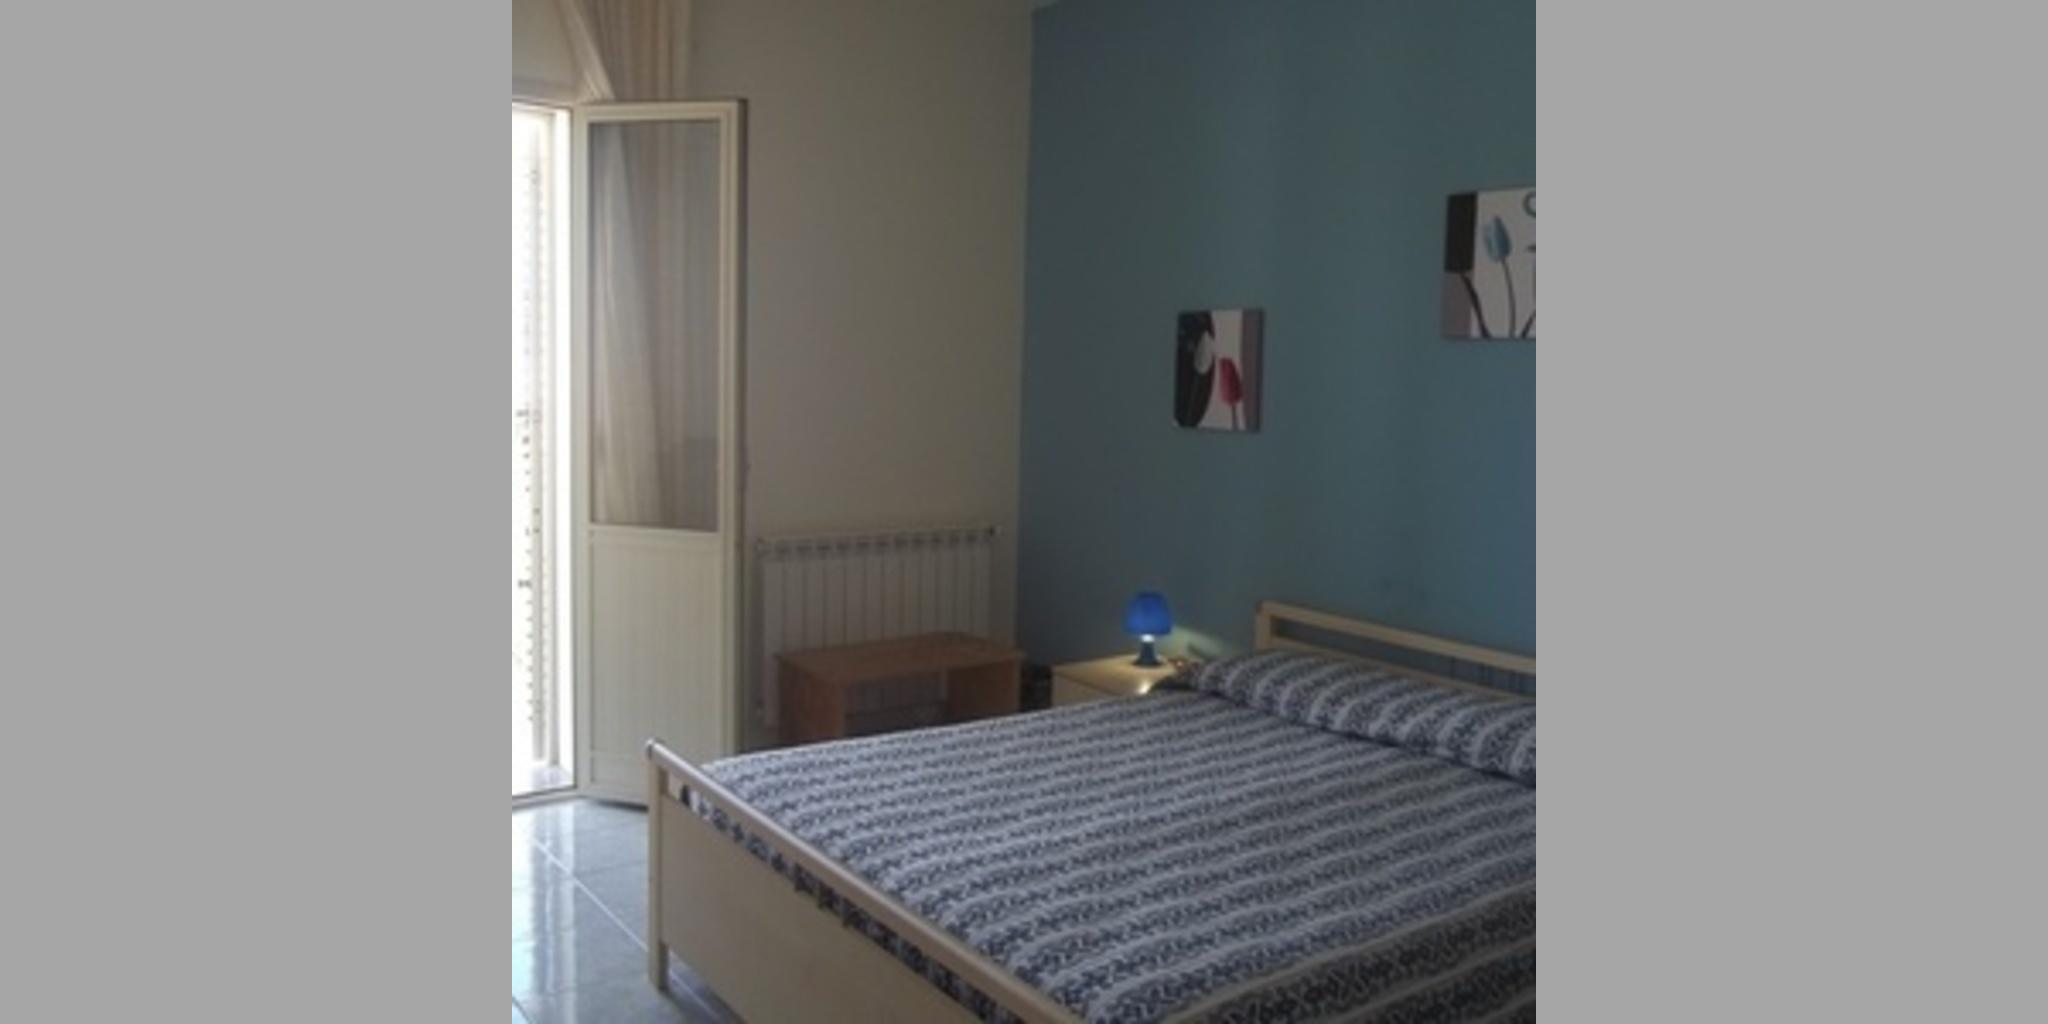 Bed & Breakfast Noto -  Principe Di Piemonte